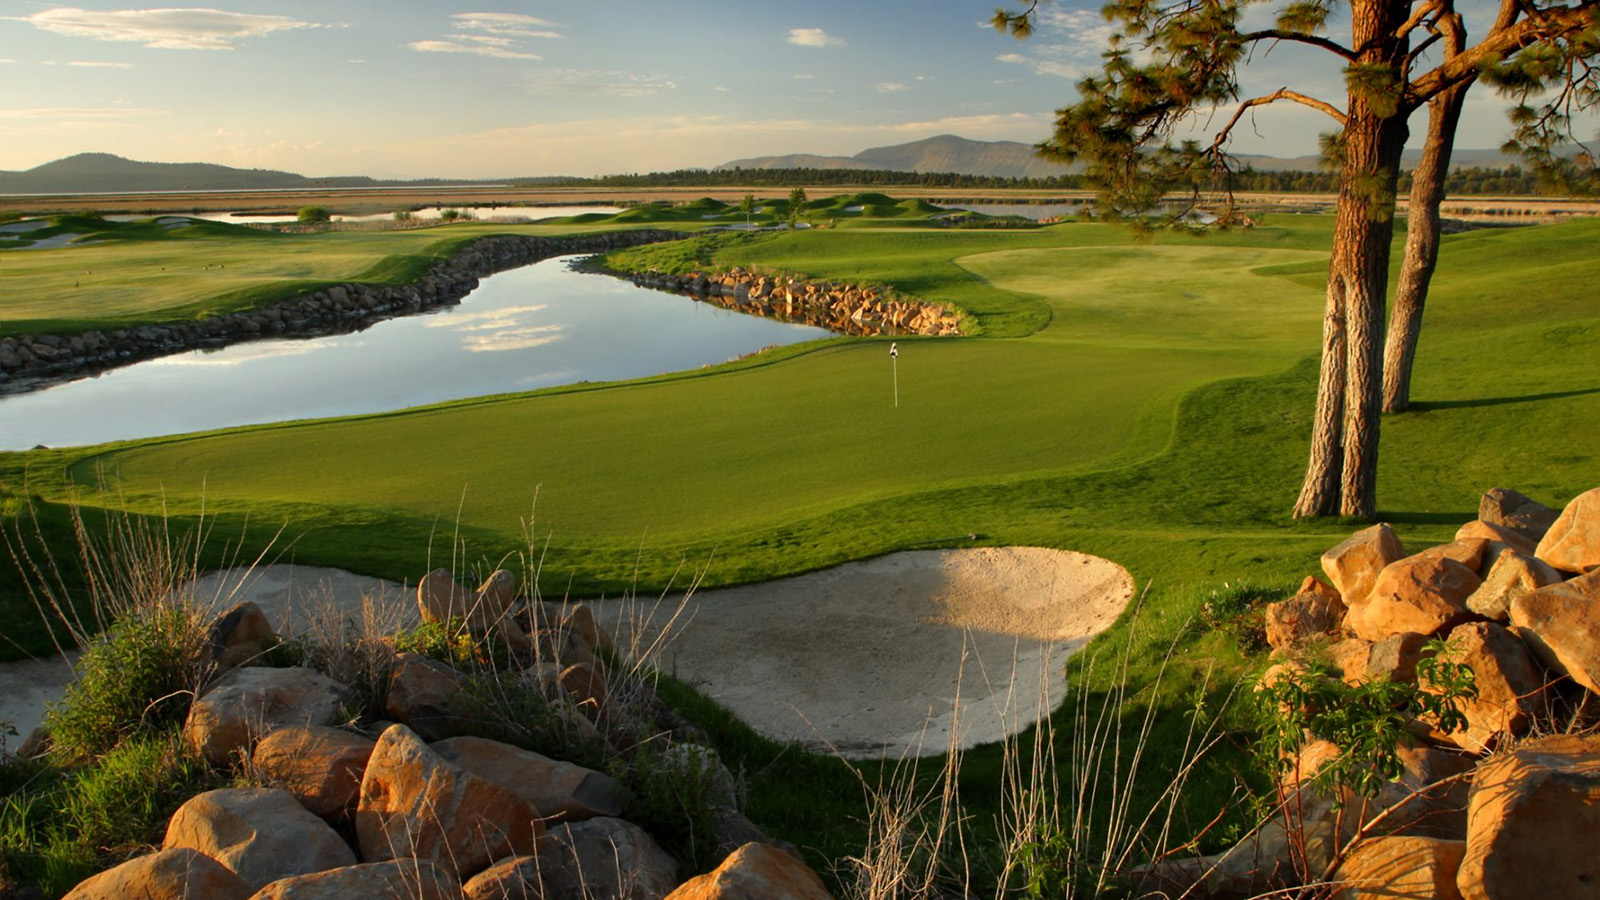 Arnold Palmer Signature Course, Running Y Ranch Resort (runningy.com)